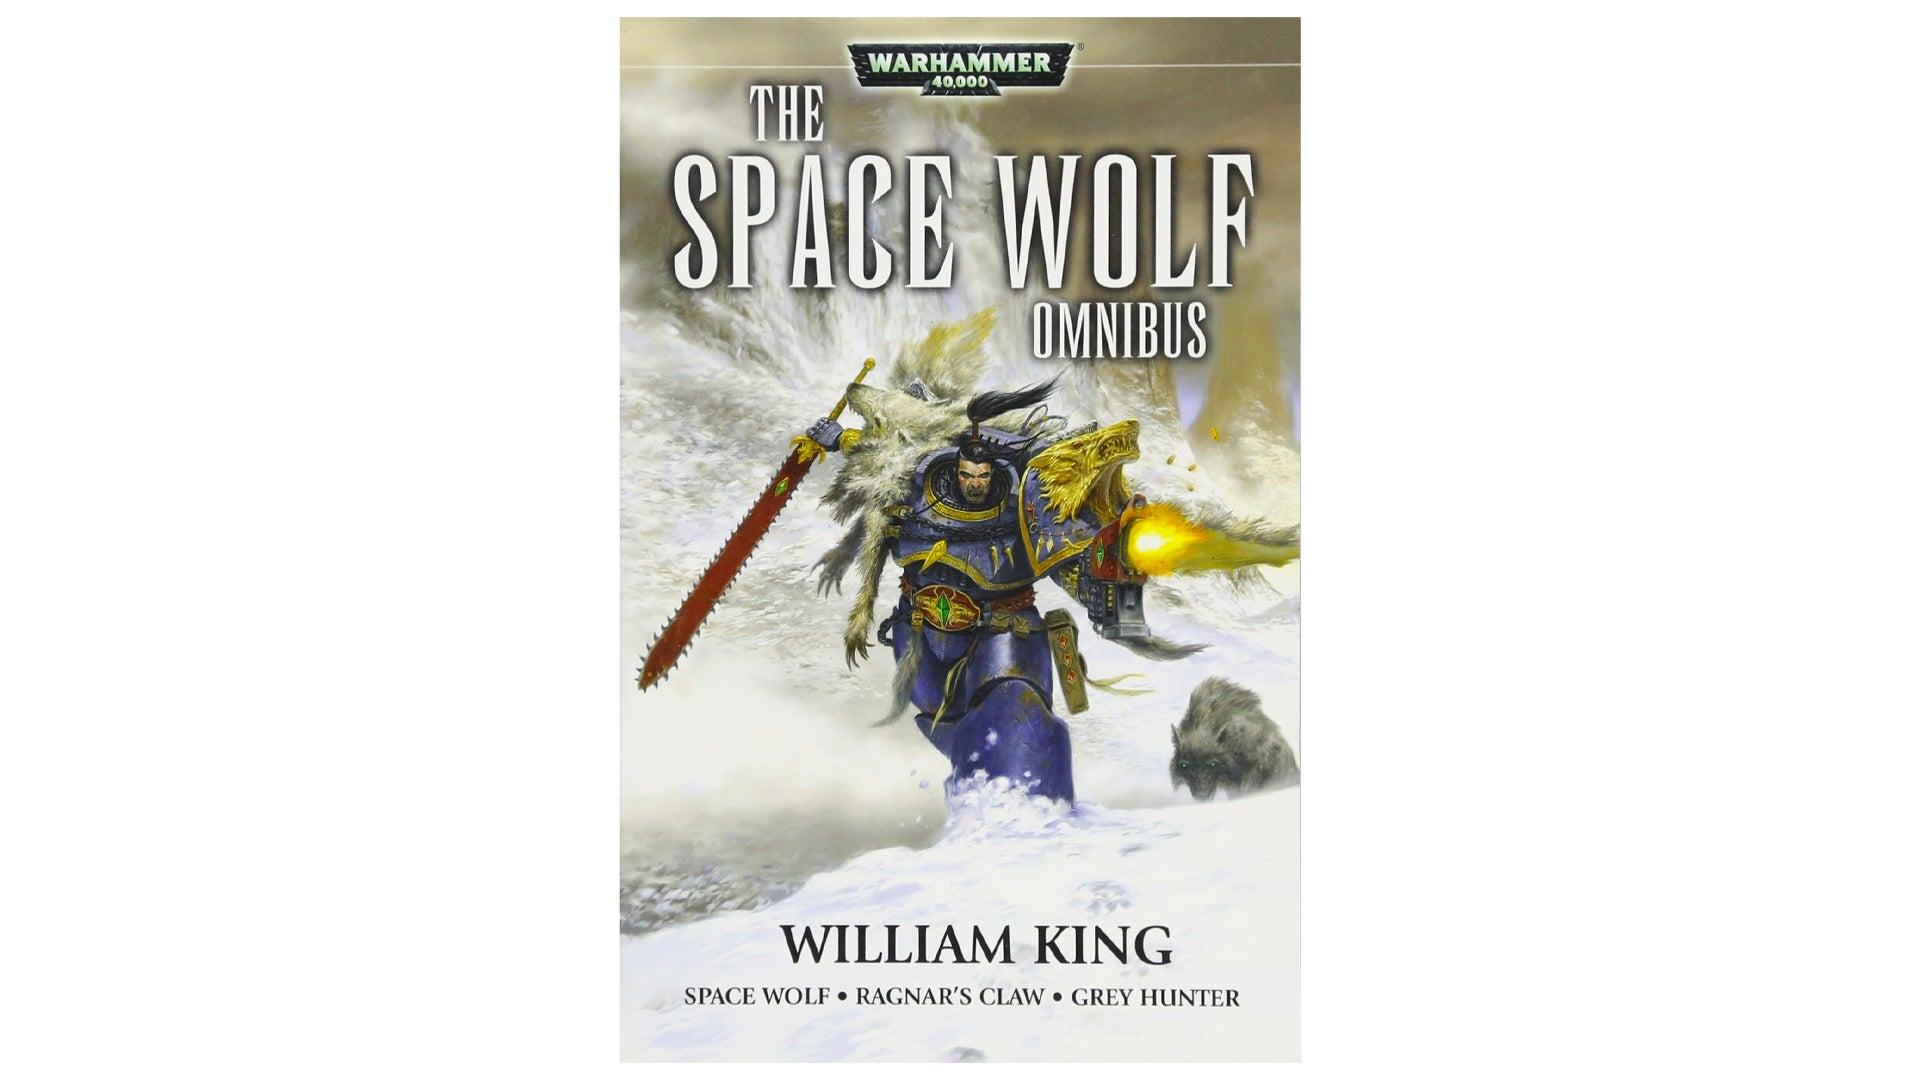 warhammer-40k-book-black-library-space-wolf-omnibus.jpg